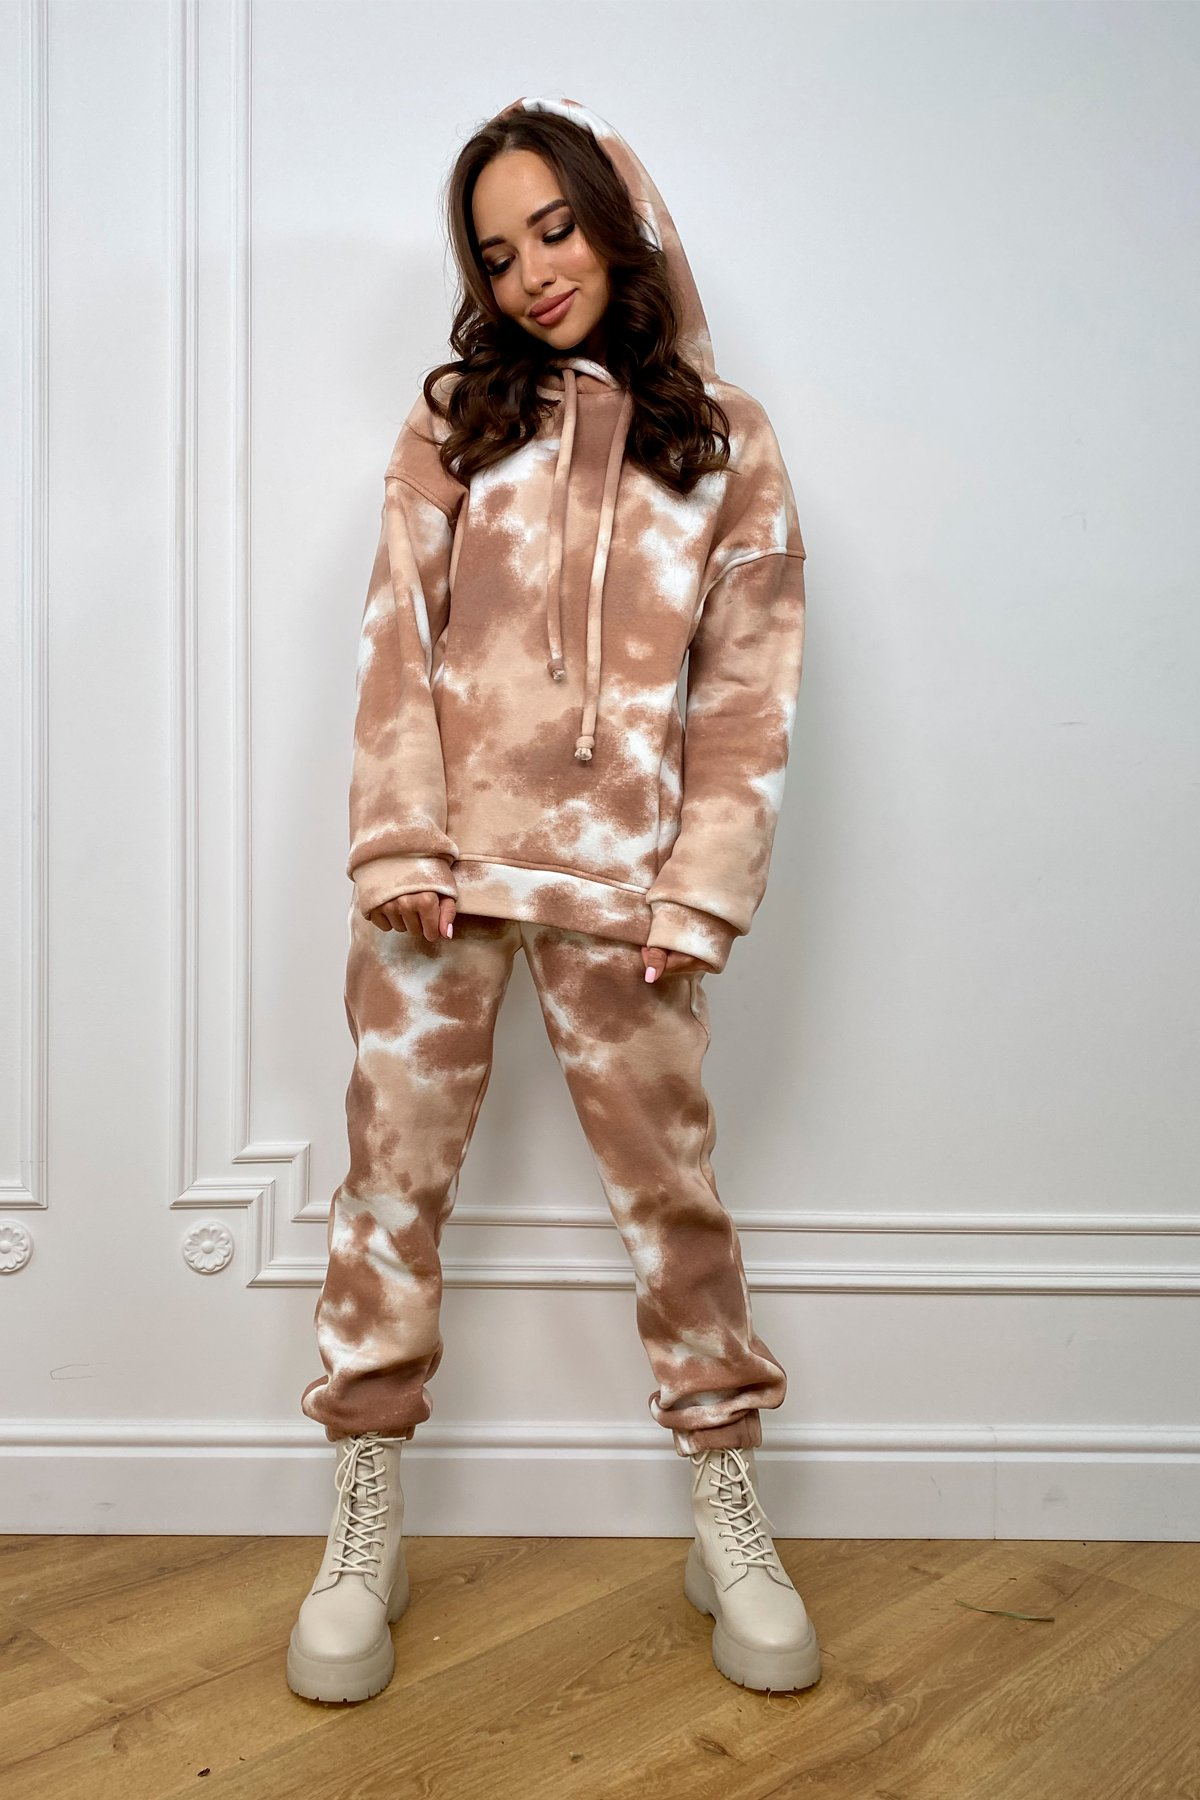 Тай Дай трикотаж 3х нитка с начесом прогулочный костюм 10241 АРТ. 46511 Цвет: Бежево-молочная - фото 3, интернет магазин tm-modus.ru